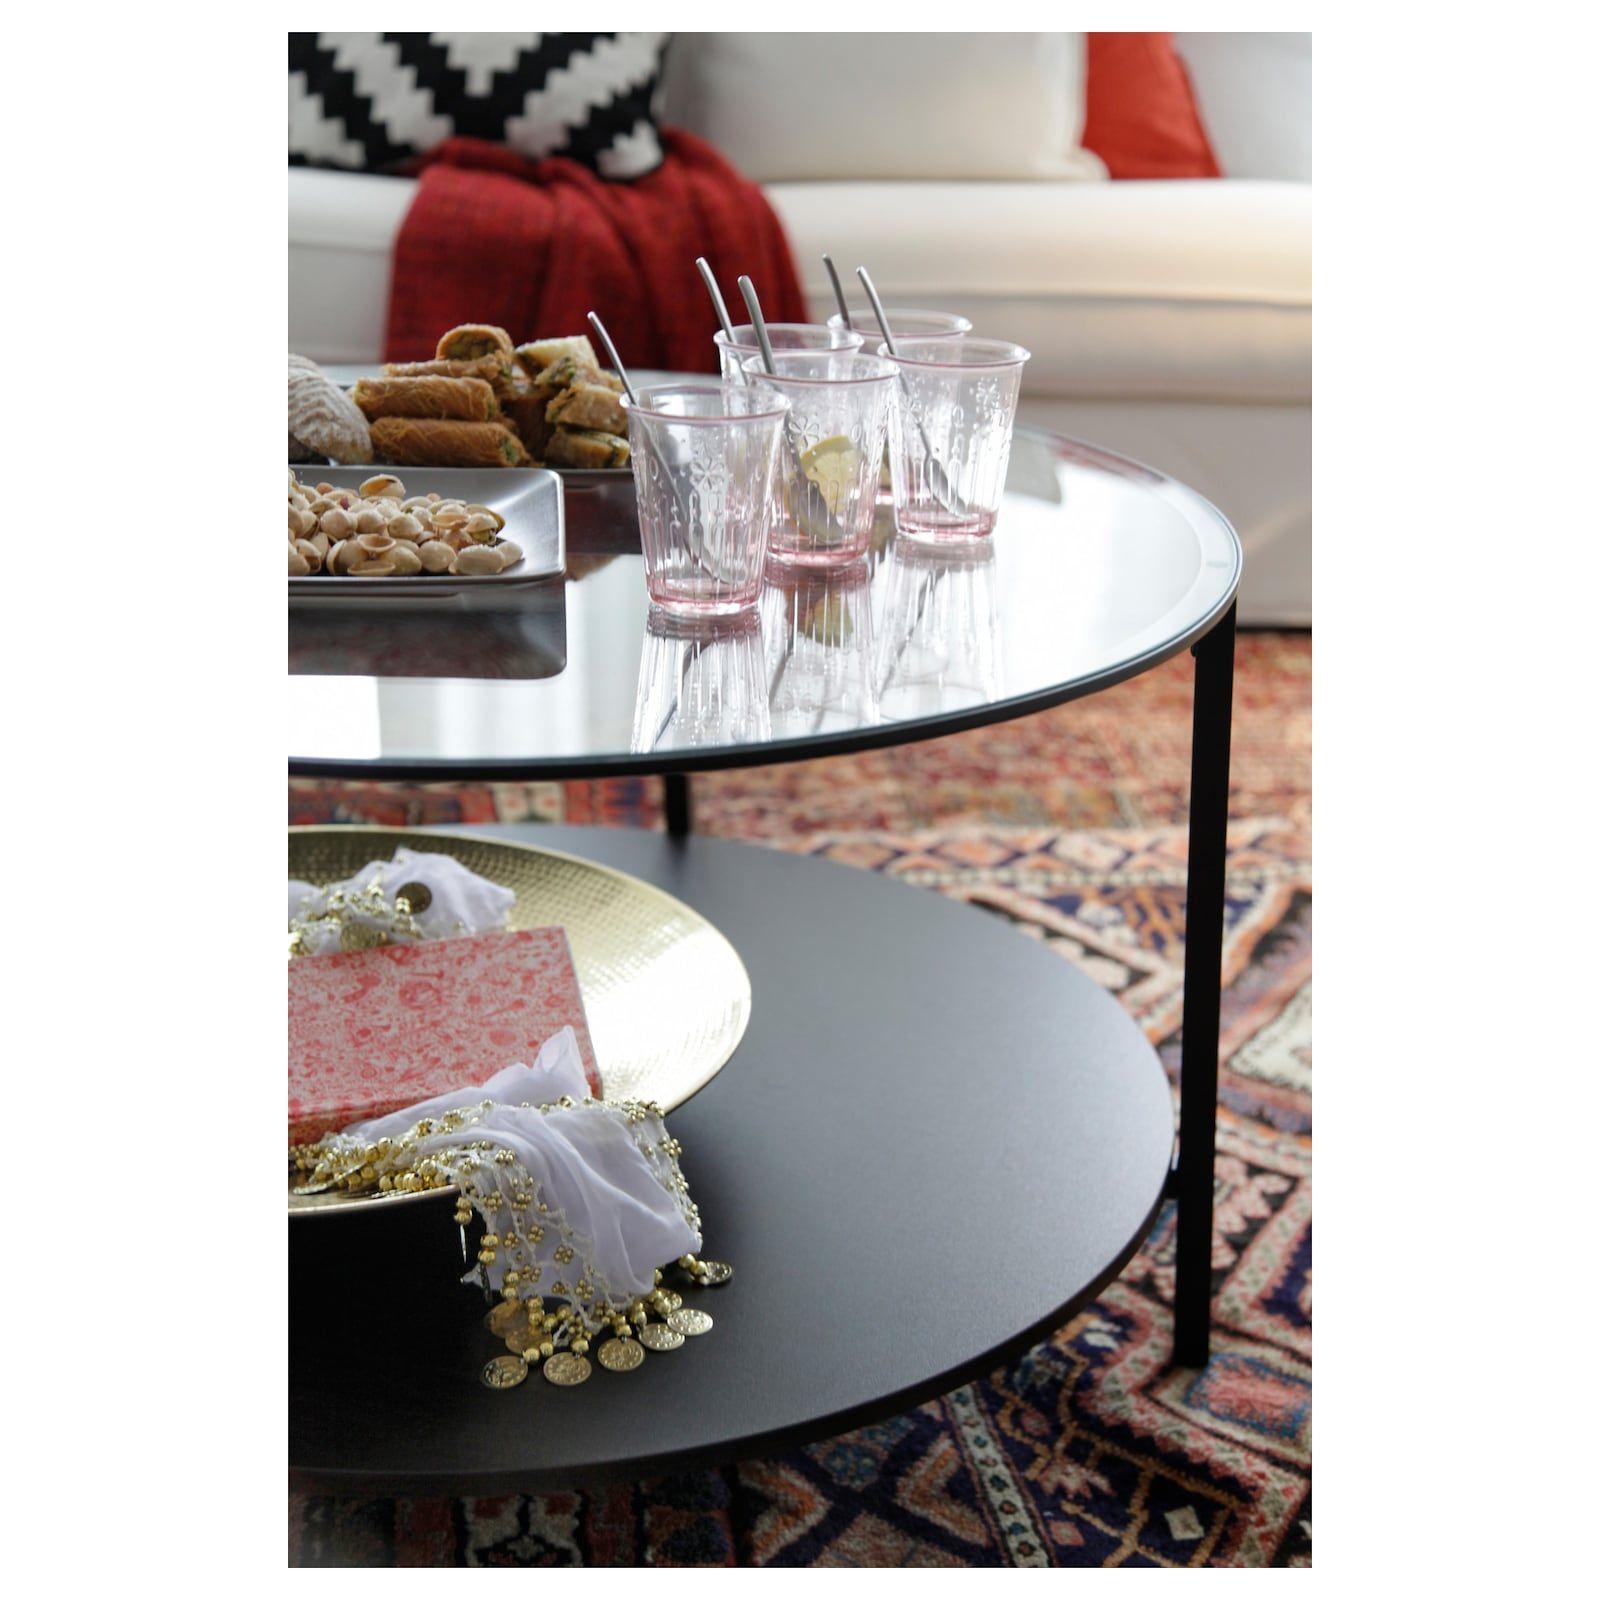 Vittsjo Black Brown Glass Coffee Table 75 Cm Ikea Coffee Table Coffee And End Tables Glass Coffee Table [ 1600 x 1600 Pixel ]